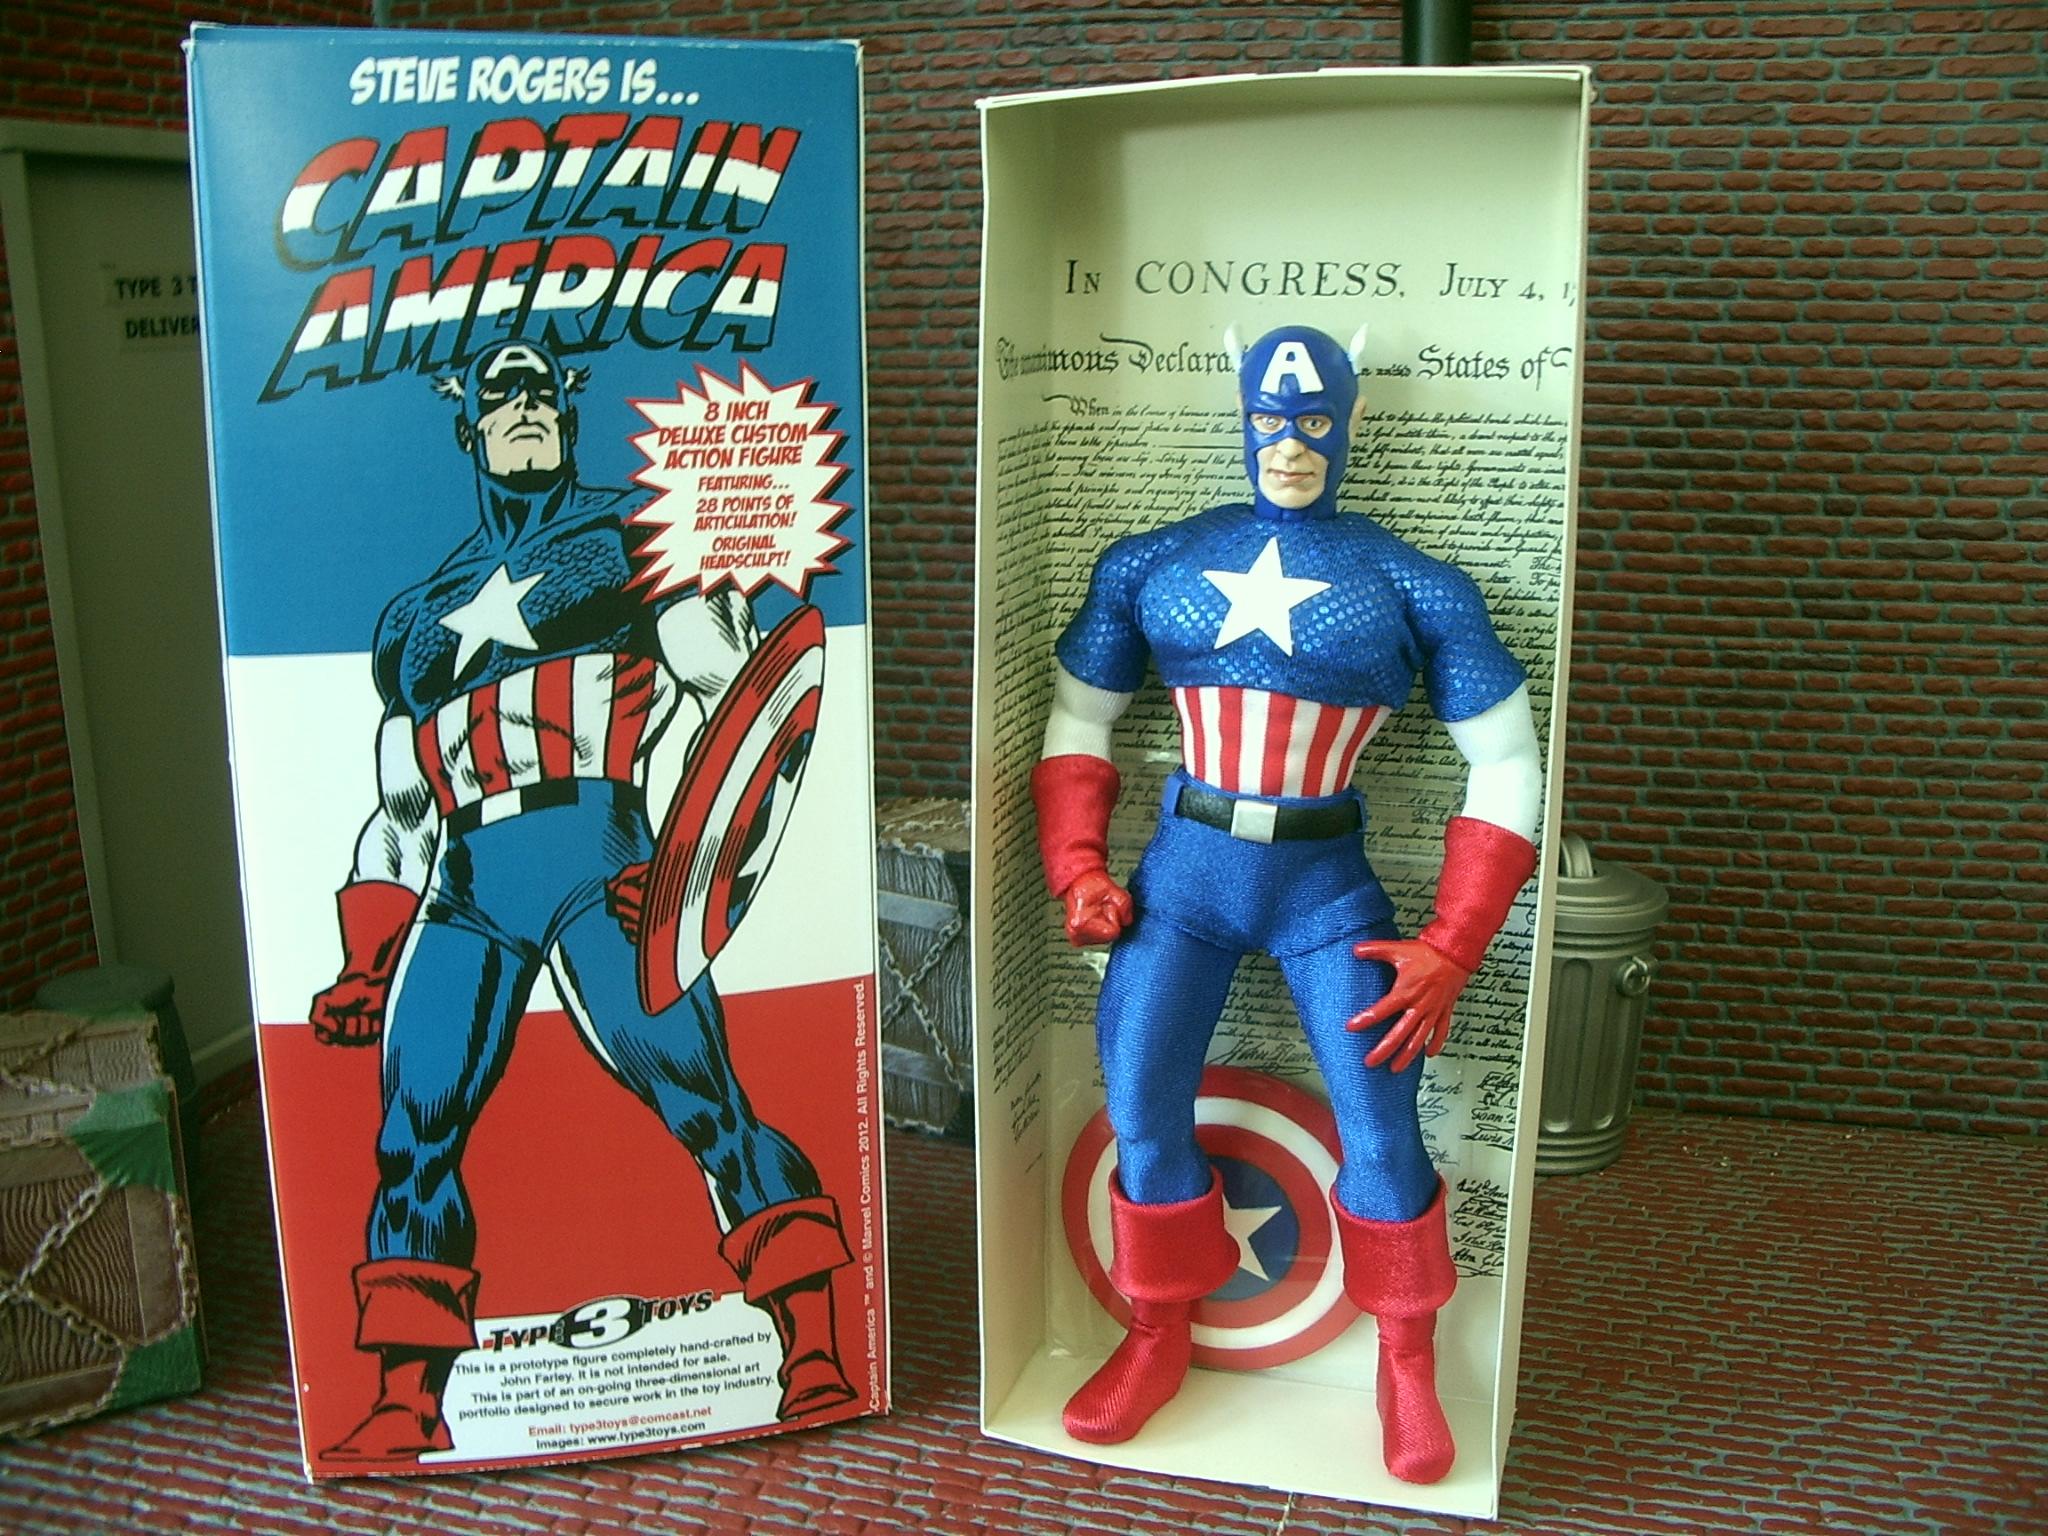 capt america-website-0002 002